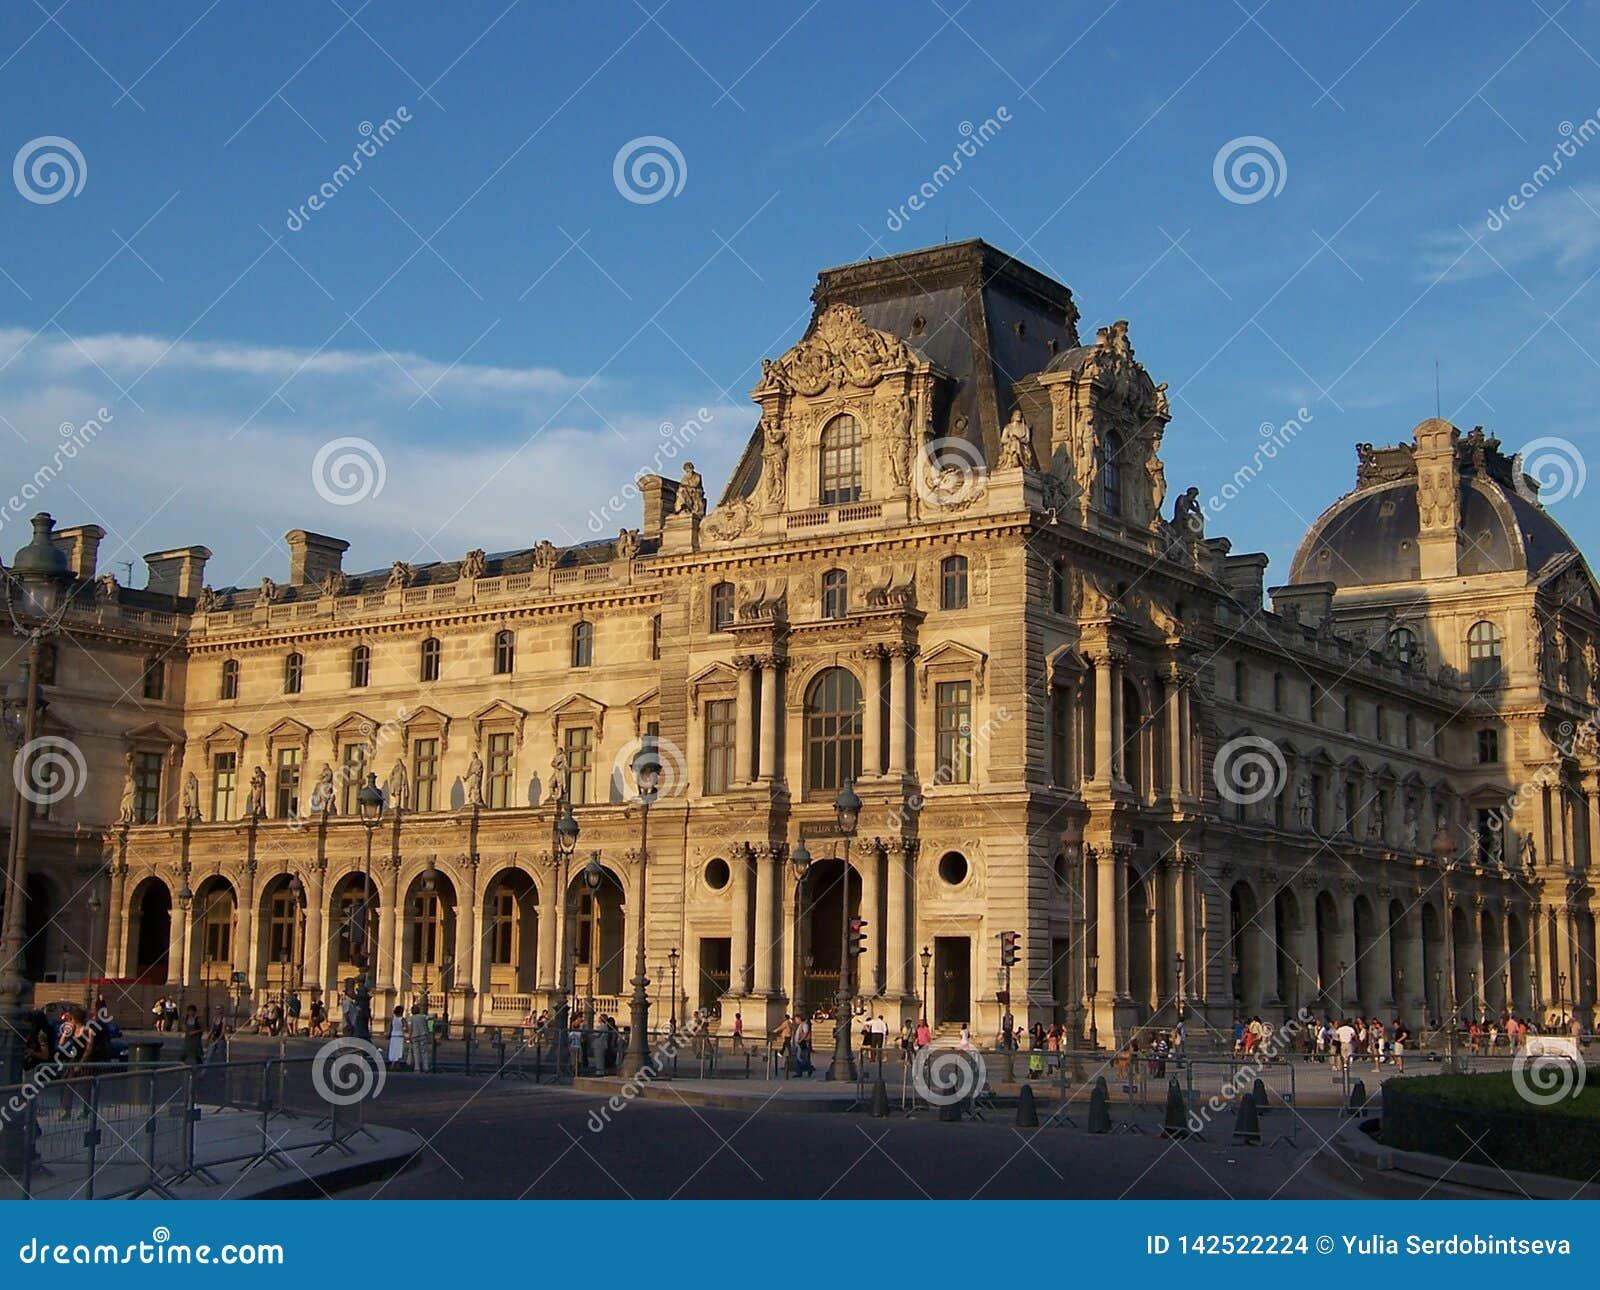 Paris Frankrike-Augusti 05, 2009: Härlig gammal arkitektur av Louvre som bygger på solnedgången på en sommarafton